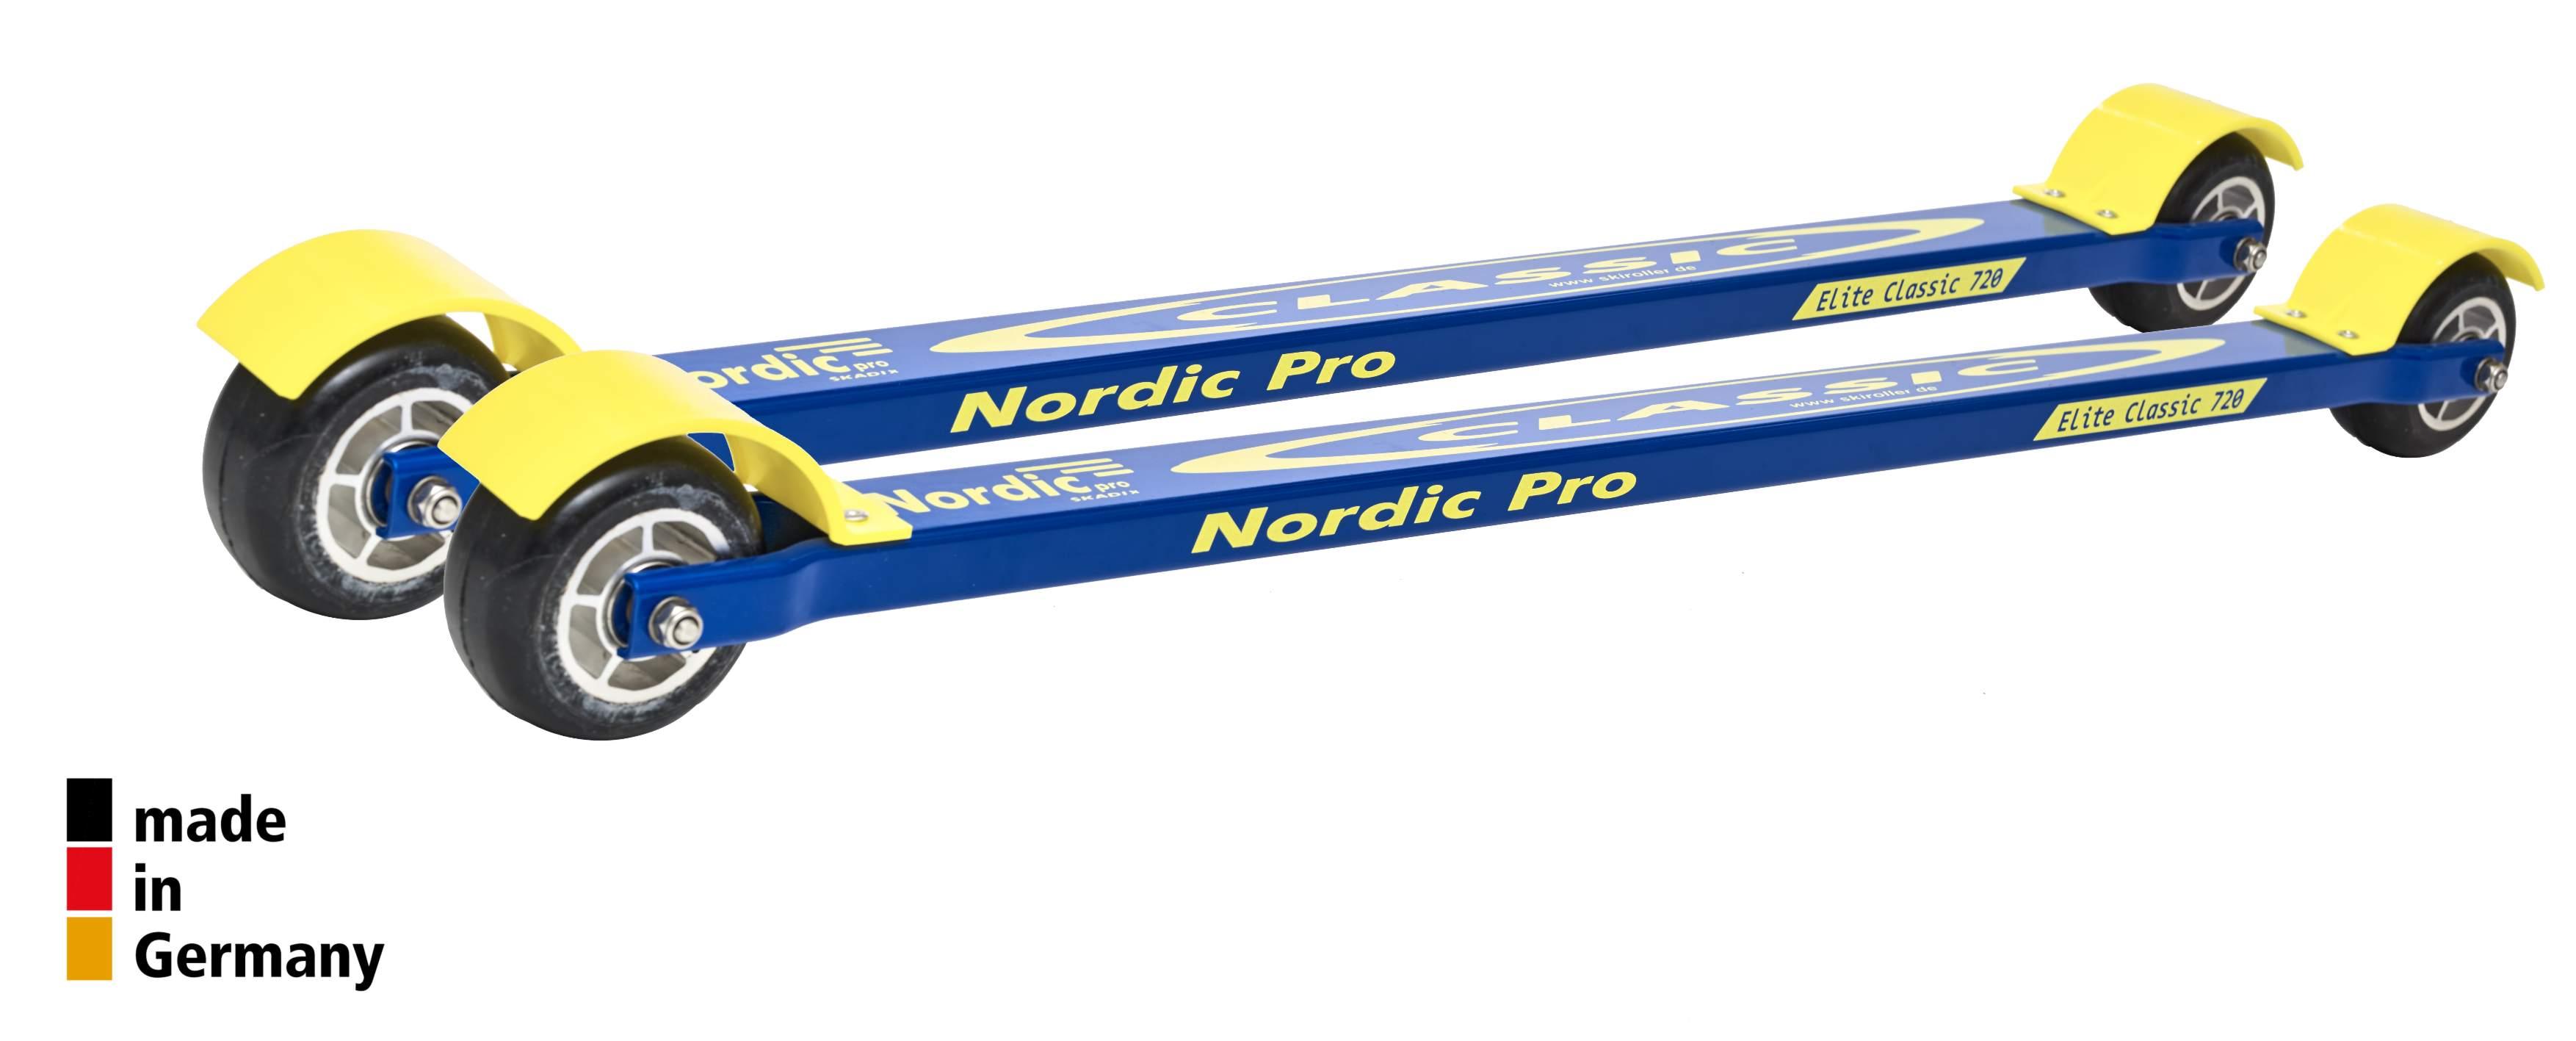 Skiroller Nordic Pro Elite Classic 720